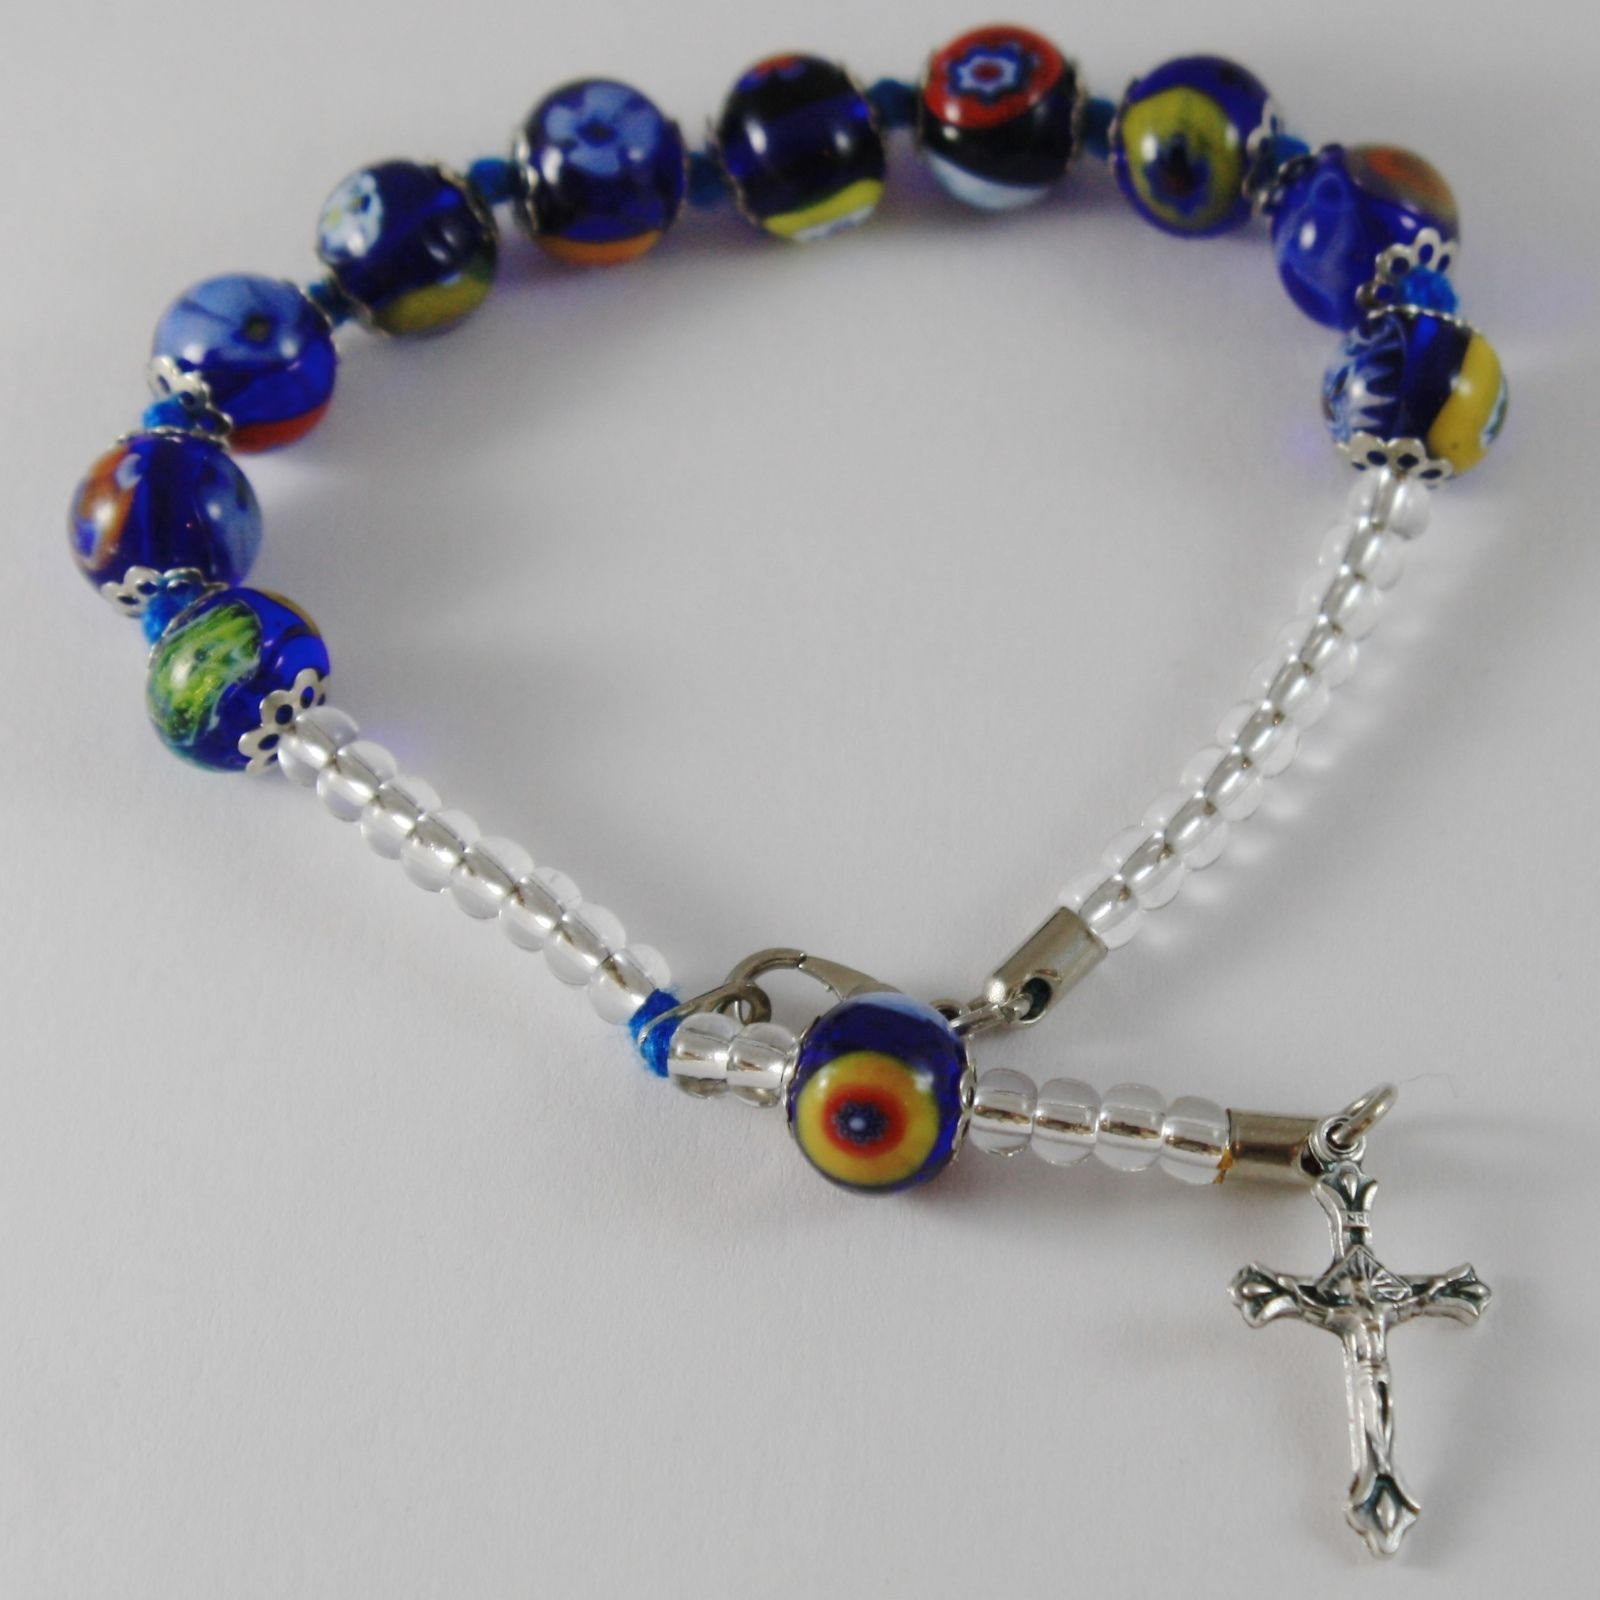 ANTICA MURRINA VENEZIA ROSARY BRACELET JESUS CROSS BLUE MULTI COLOR SPHERES